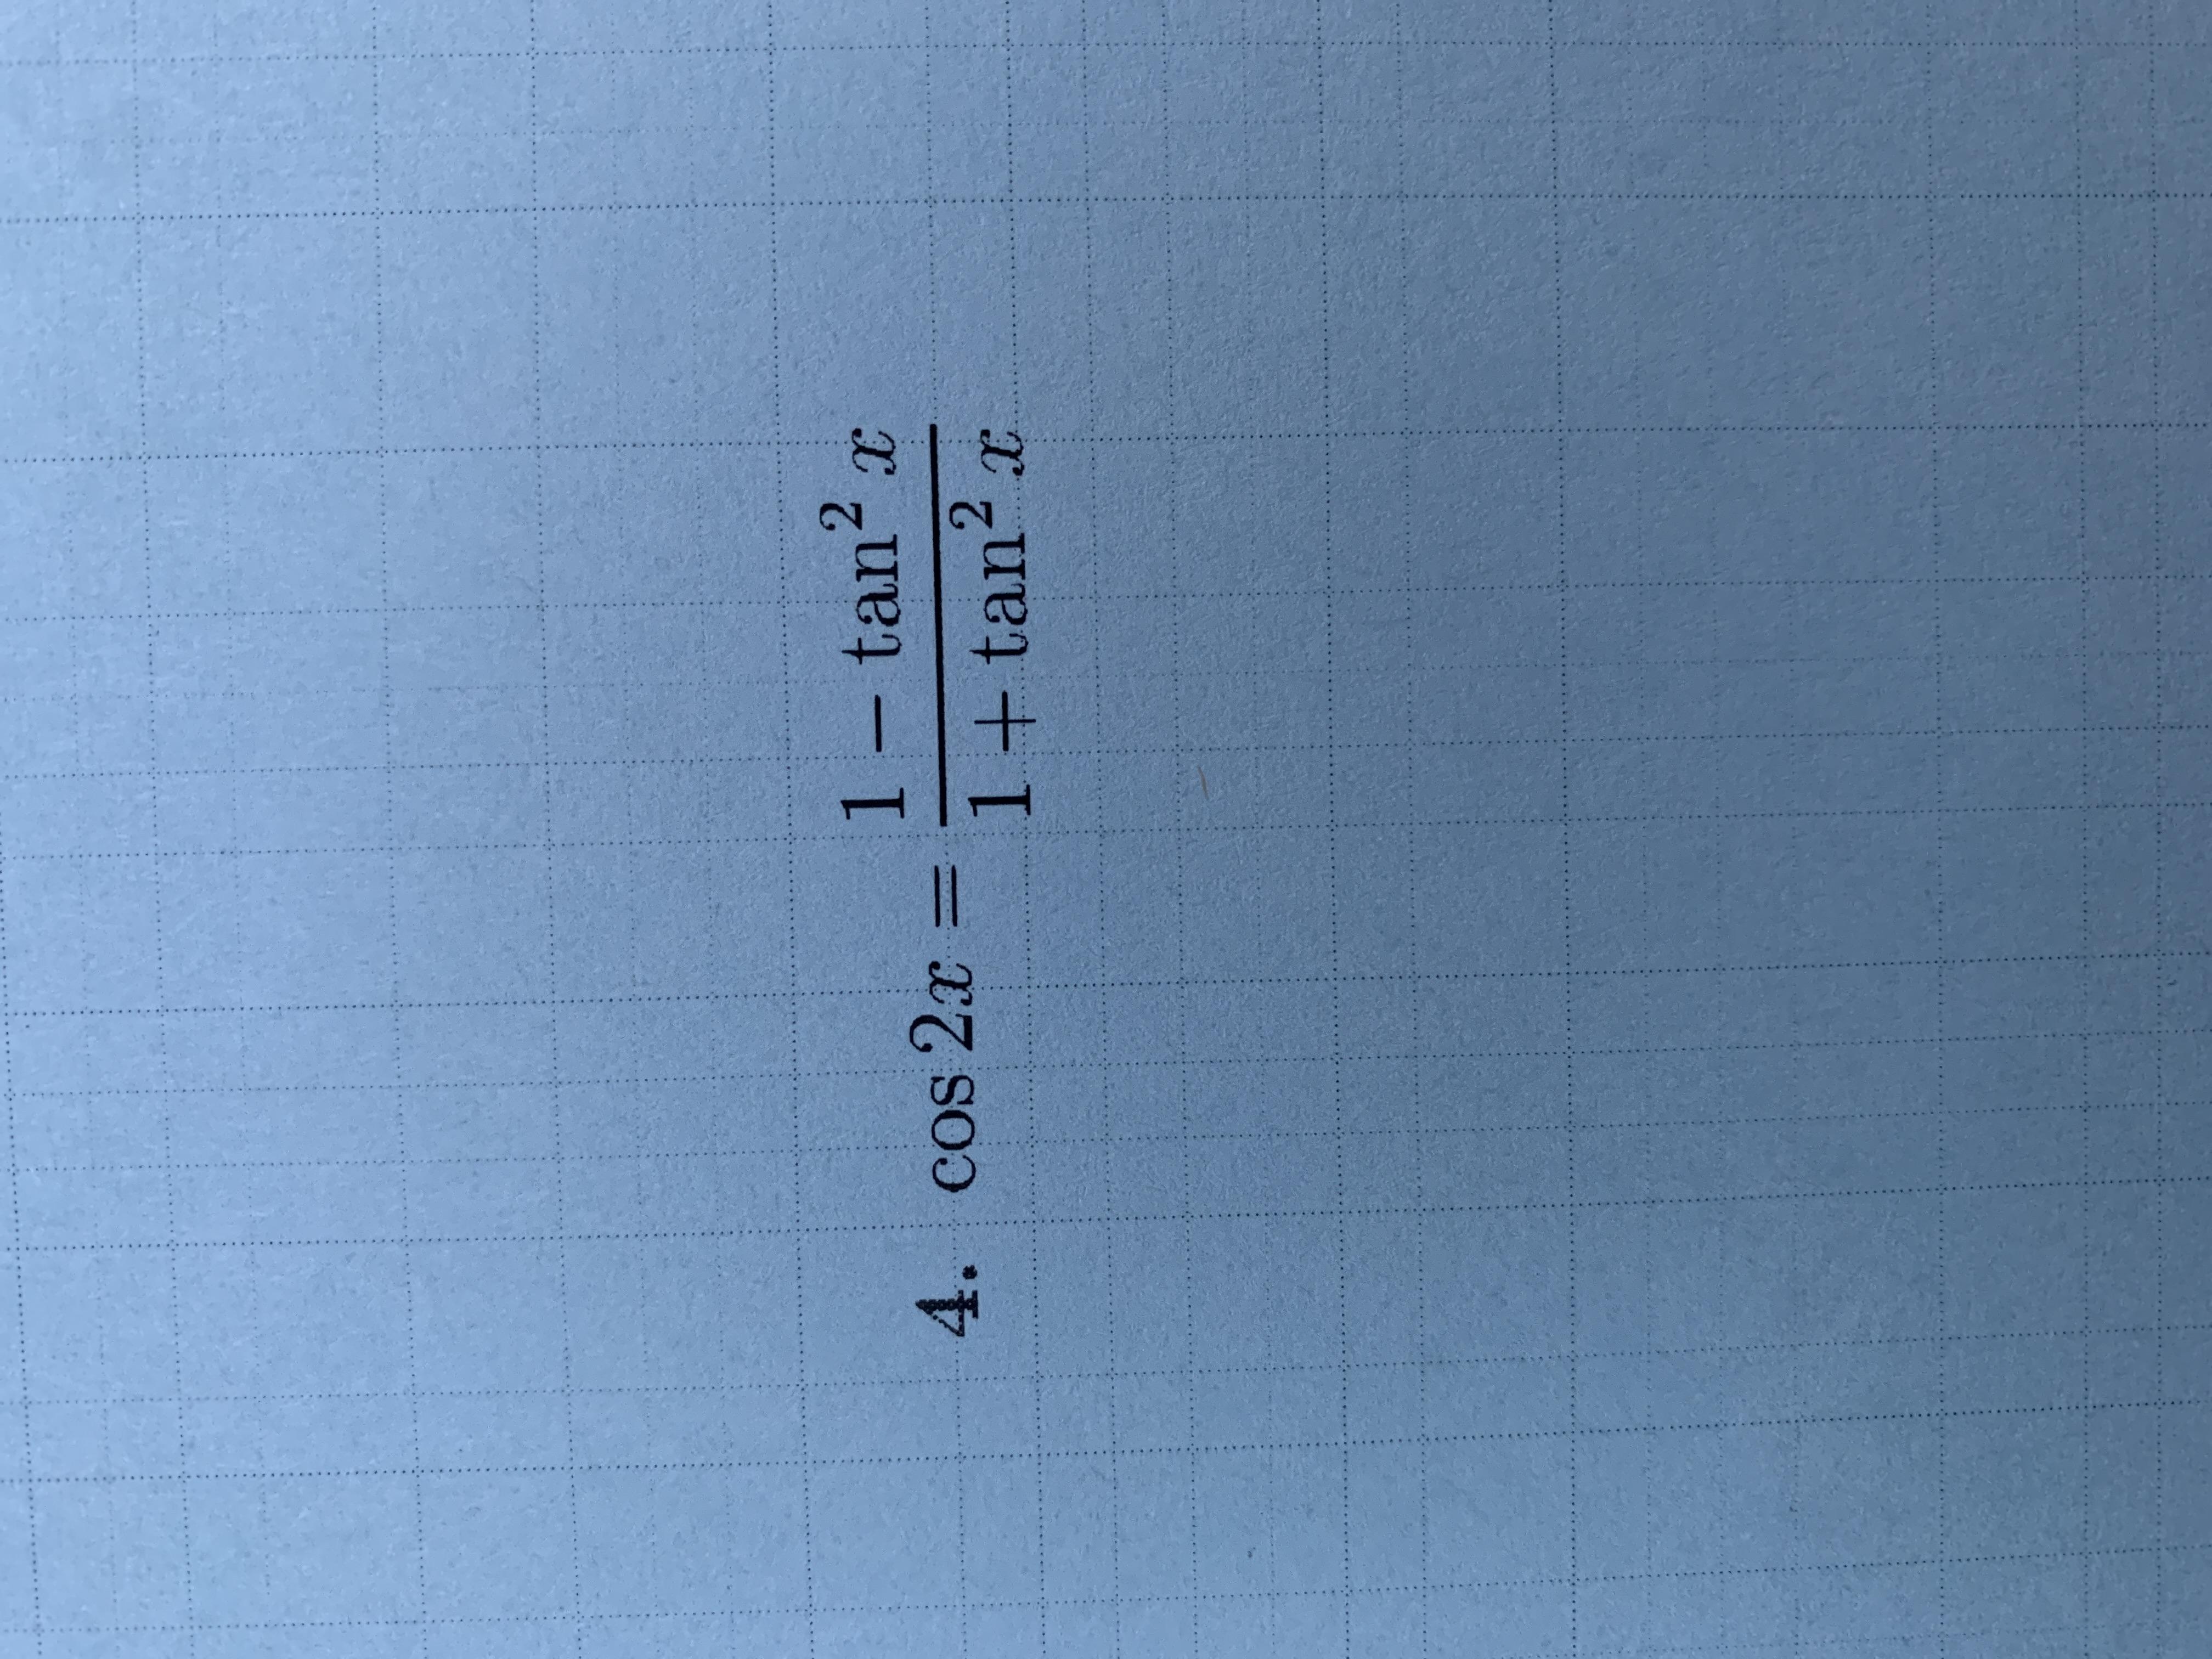 1 - tan2 x X 4. cos 2x 1 +tan2